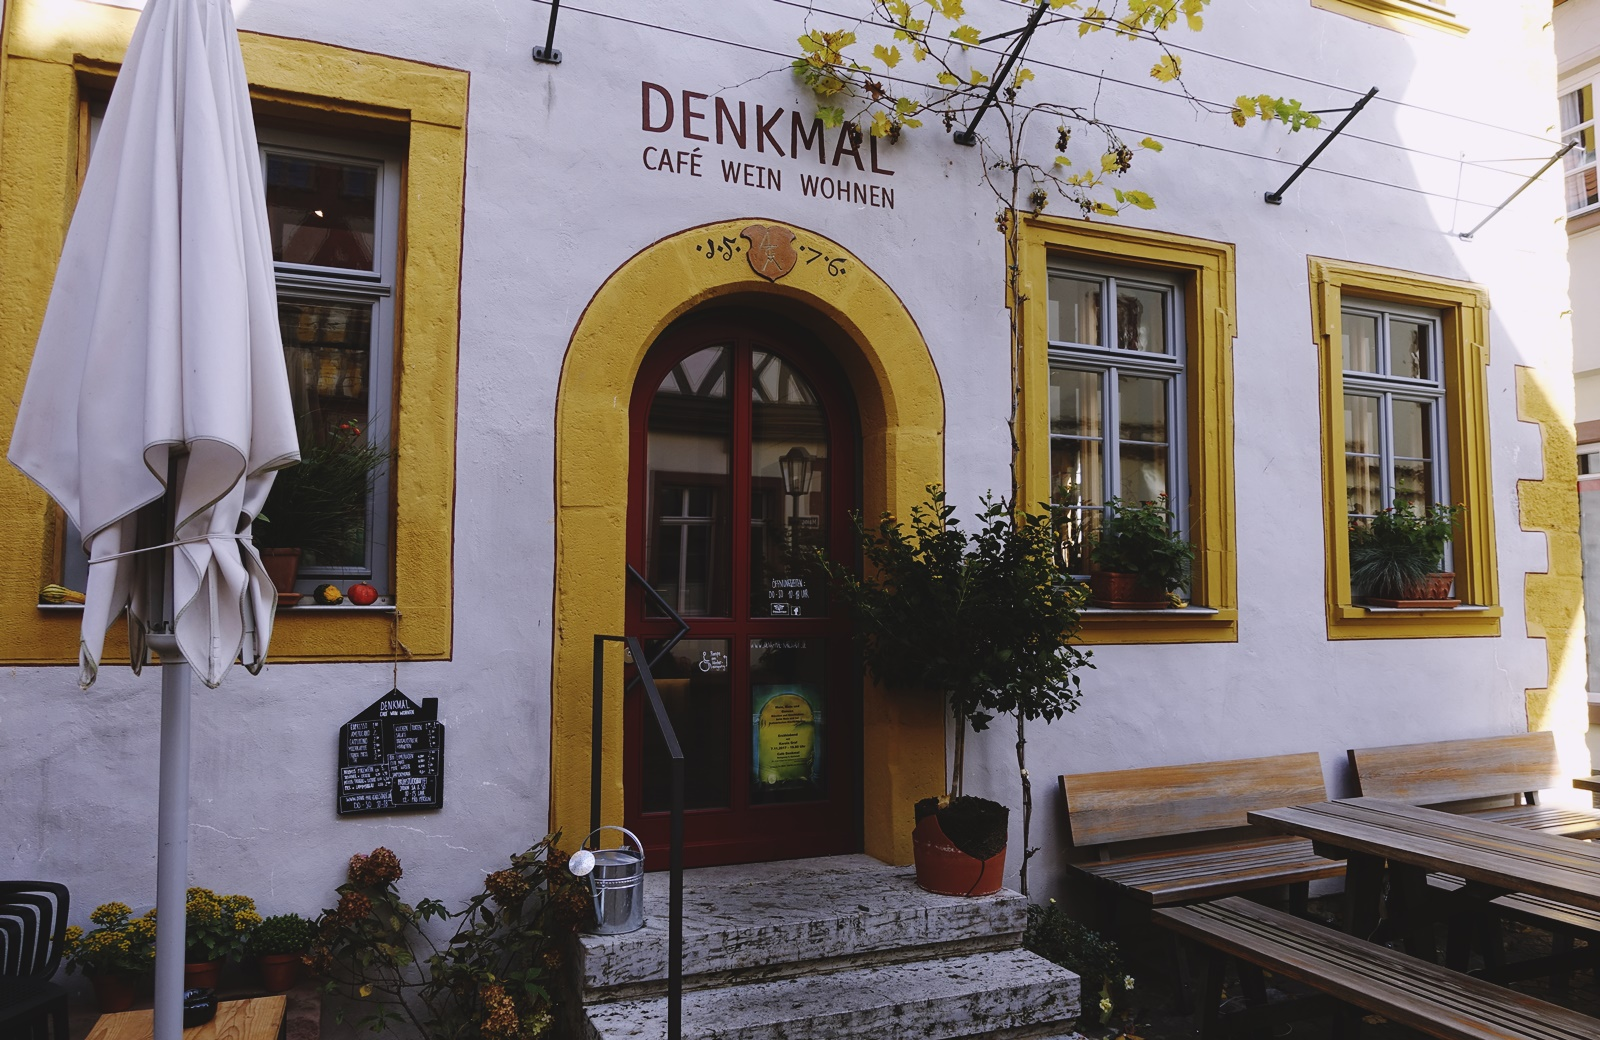 Frontansicht Cafe Denkmal Maingasse Karlstadt